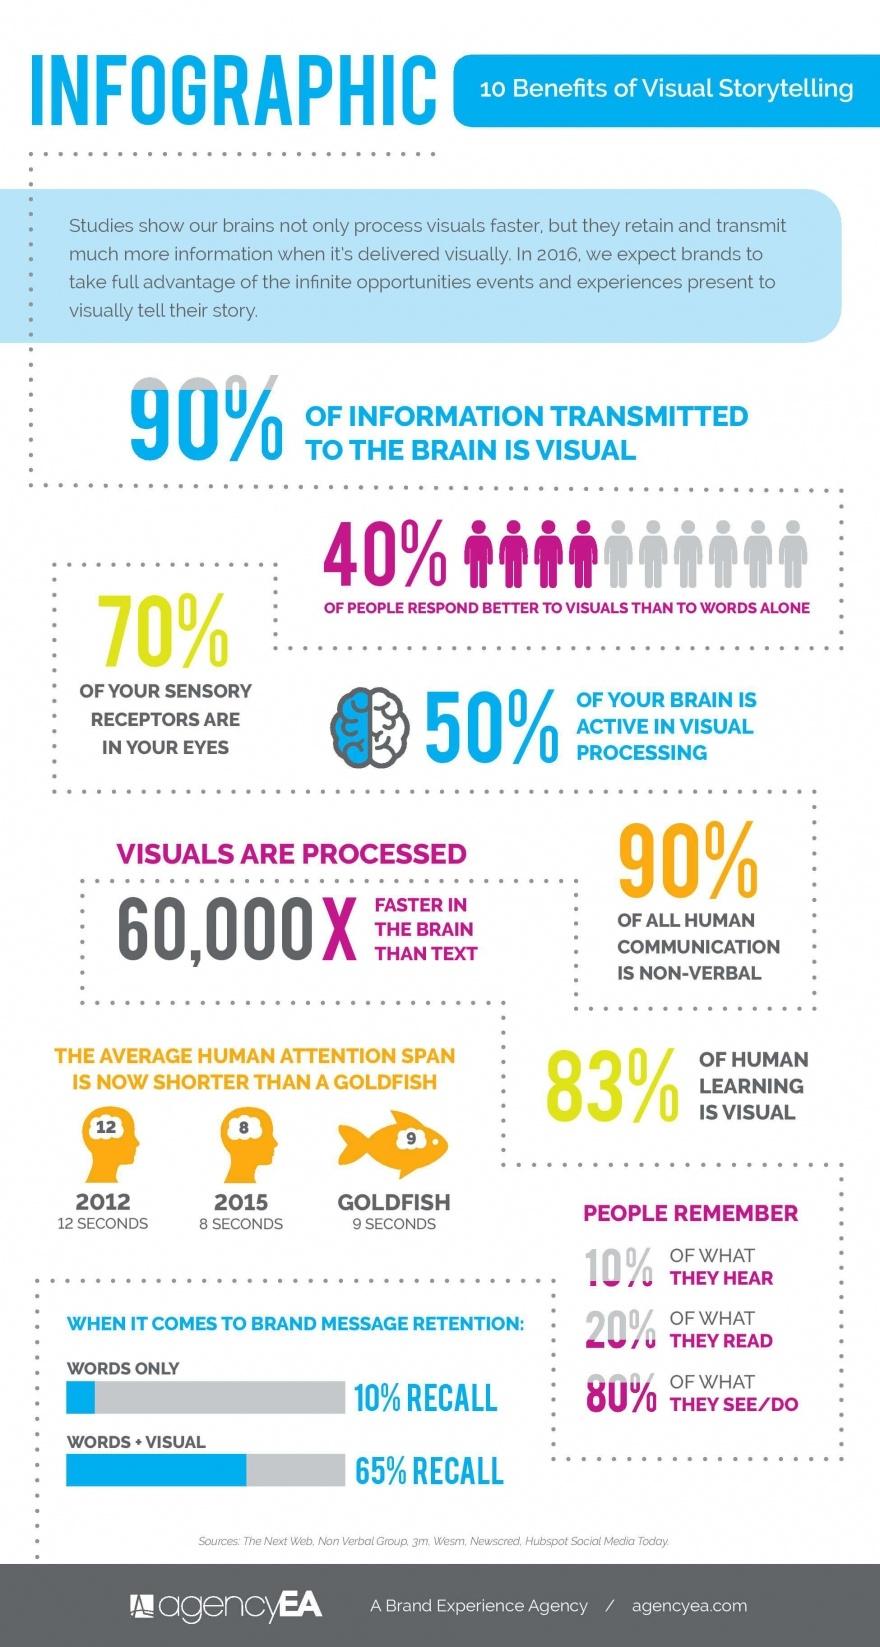 10-benefits-of-visual-storytelling_infographic_1.jpg